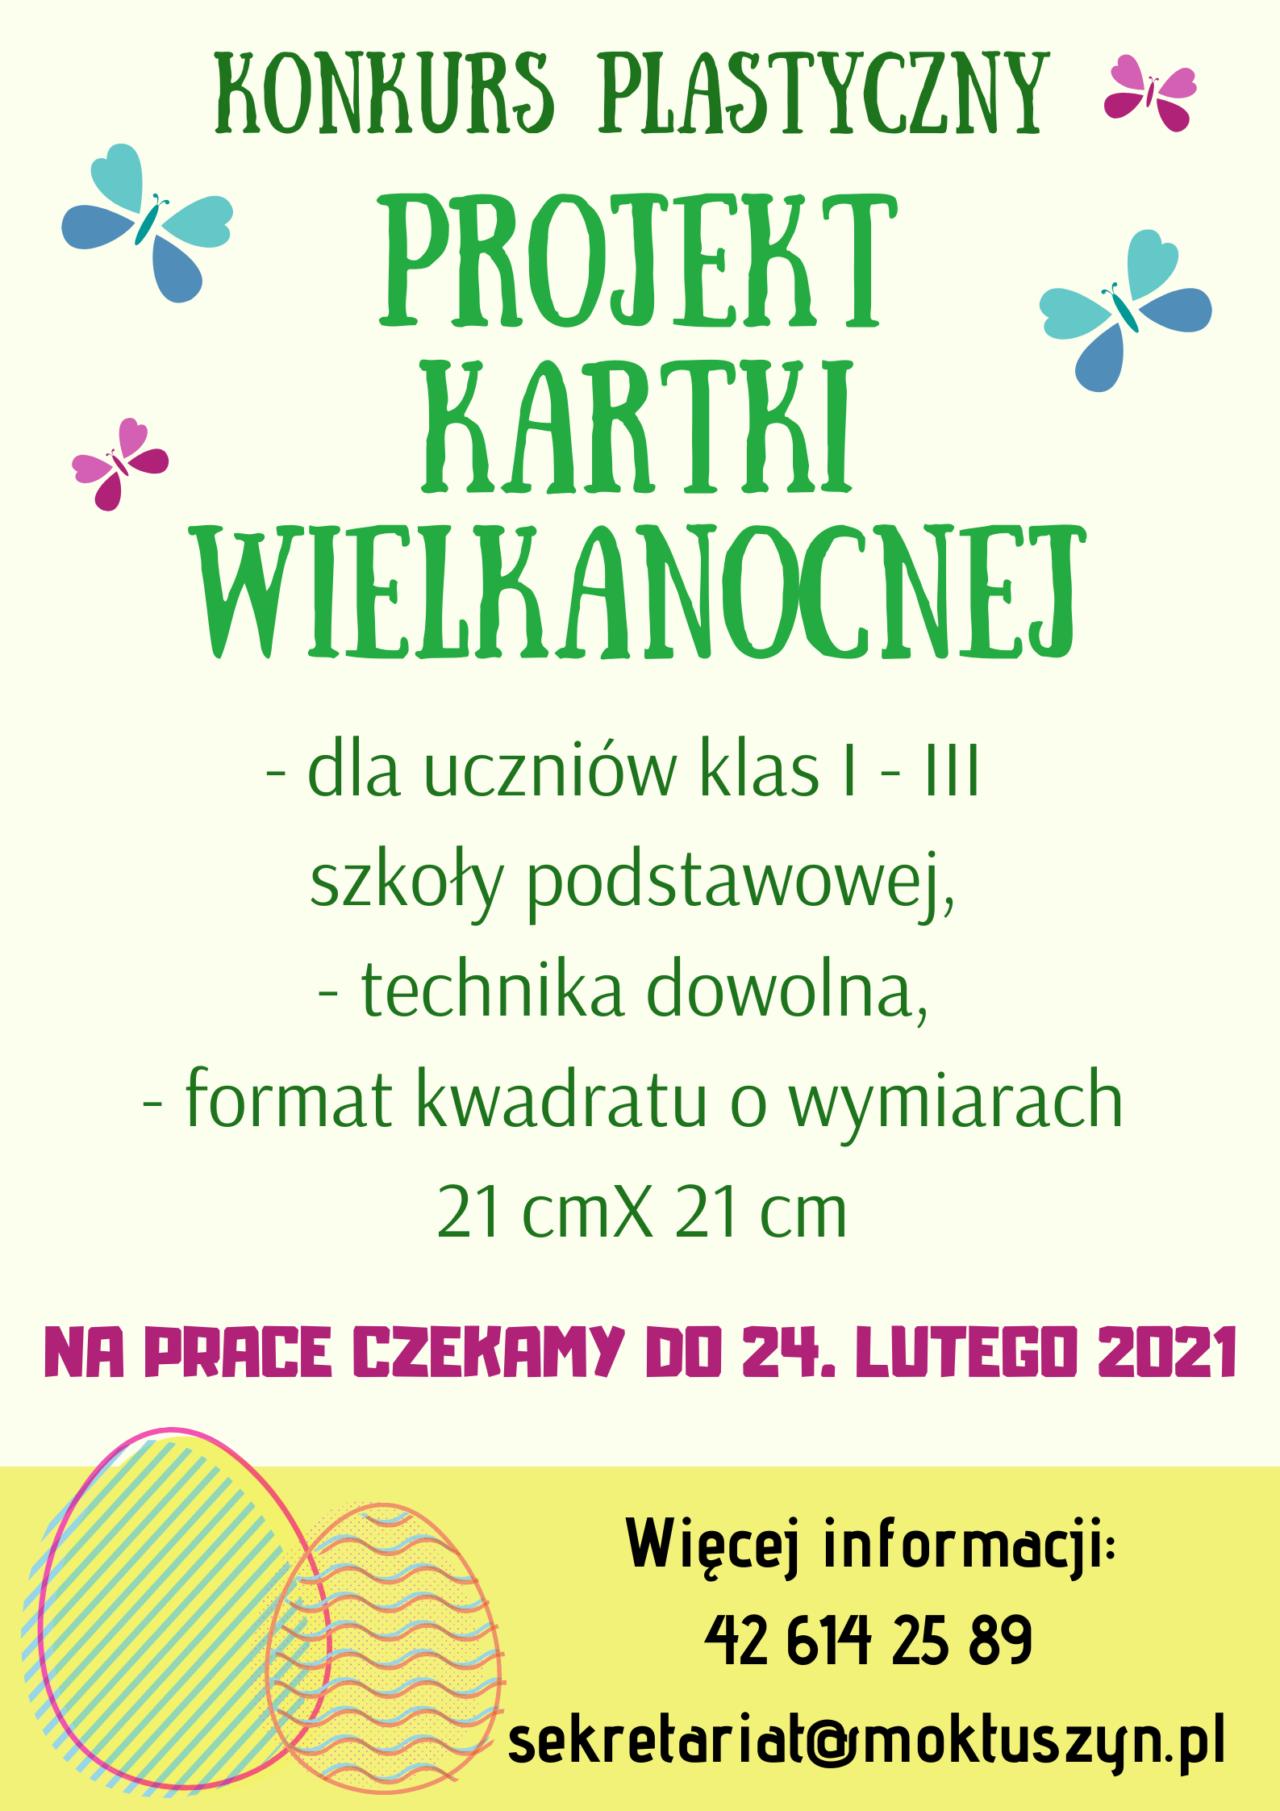 https://mcktuszyn.pl/wp-content/uploads/2021/02/Kartka-Wielkanocna-1280x1811.png